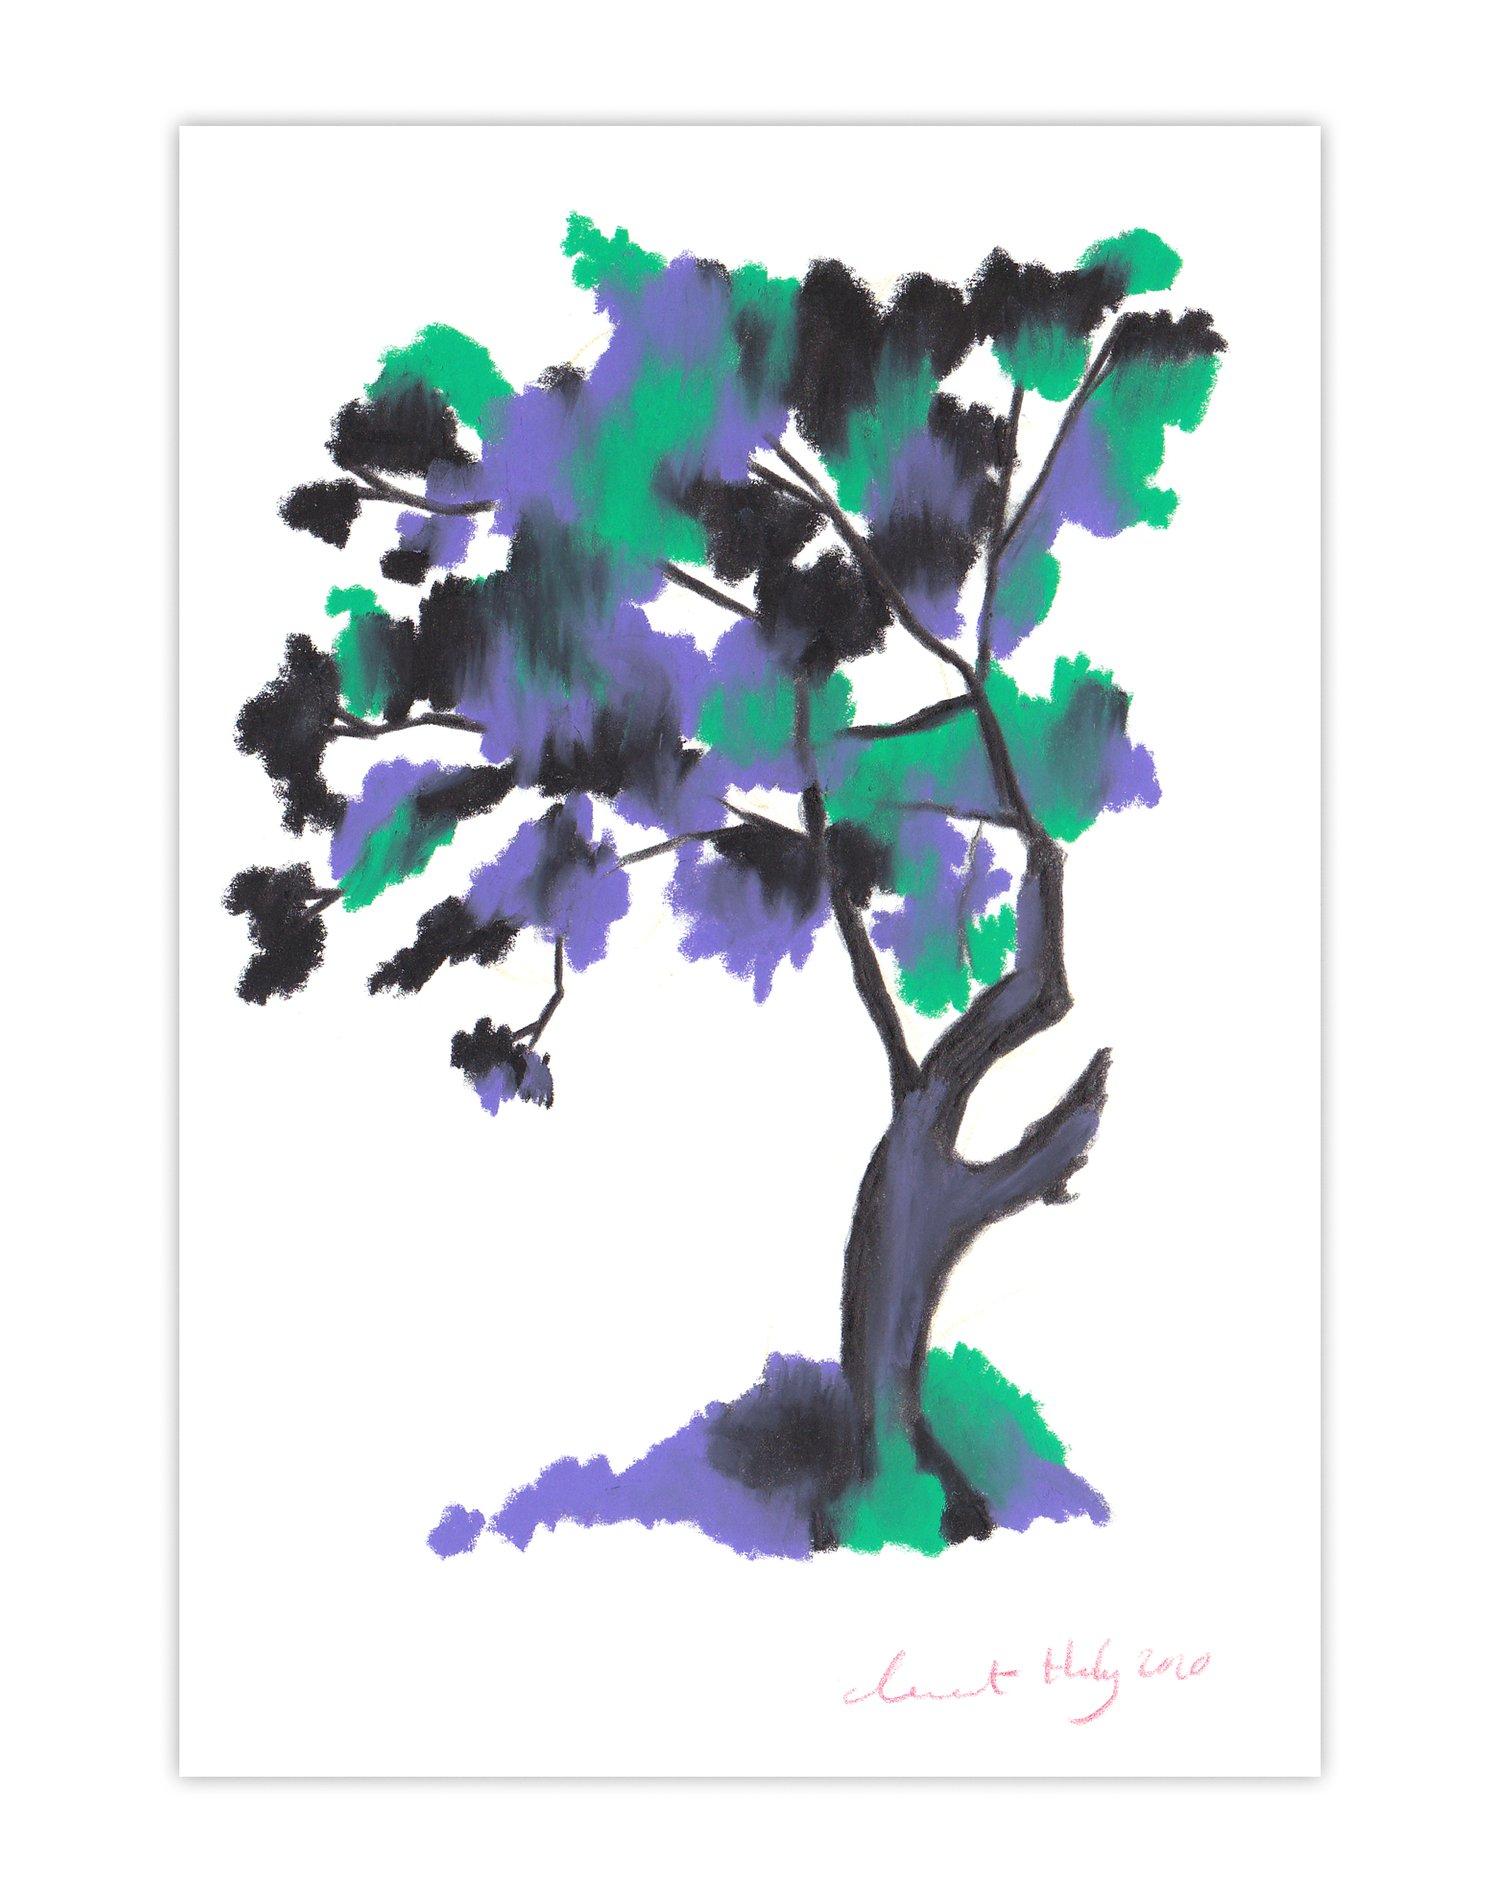 Image of Tree #434